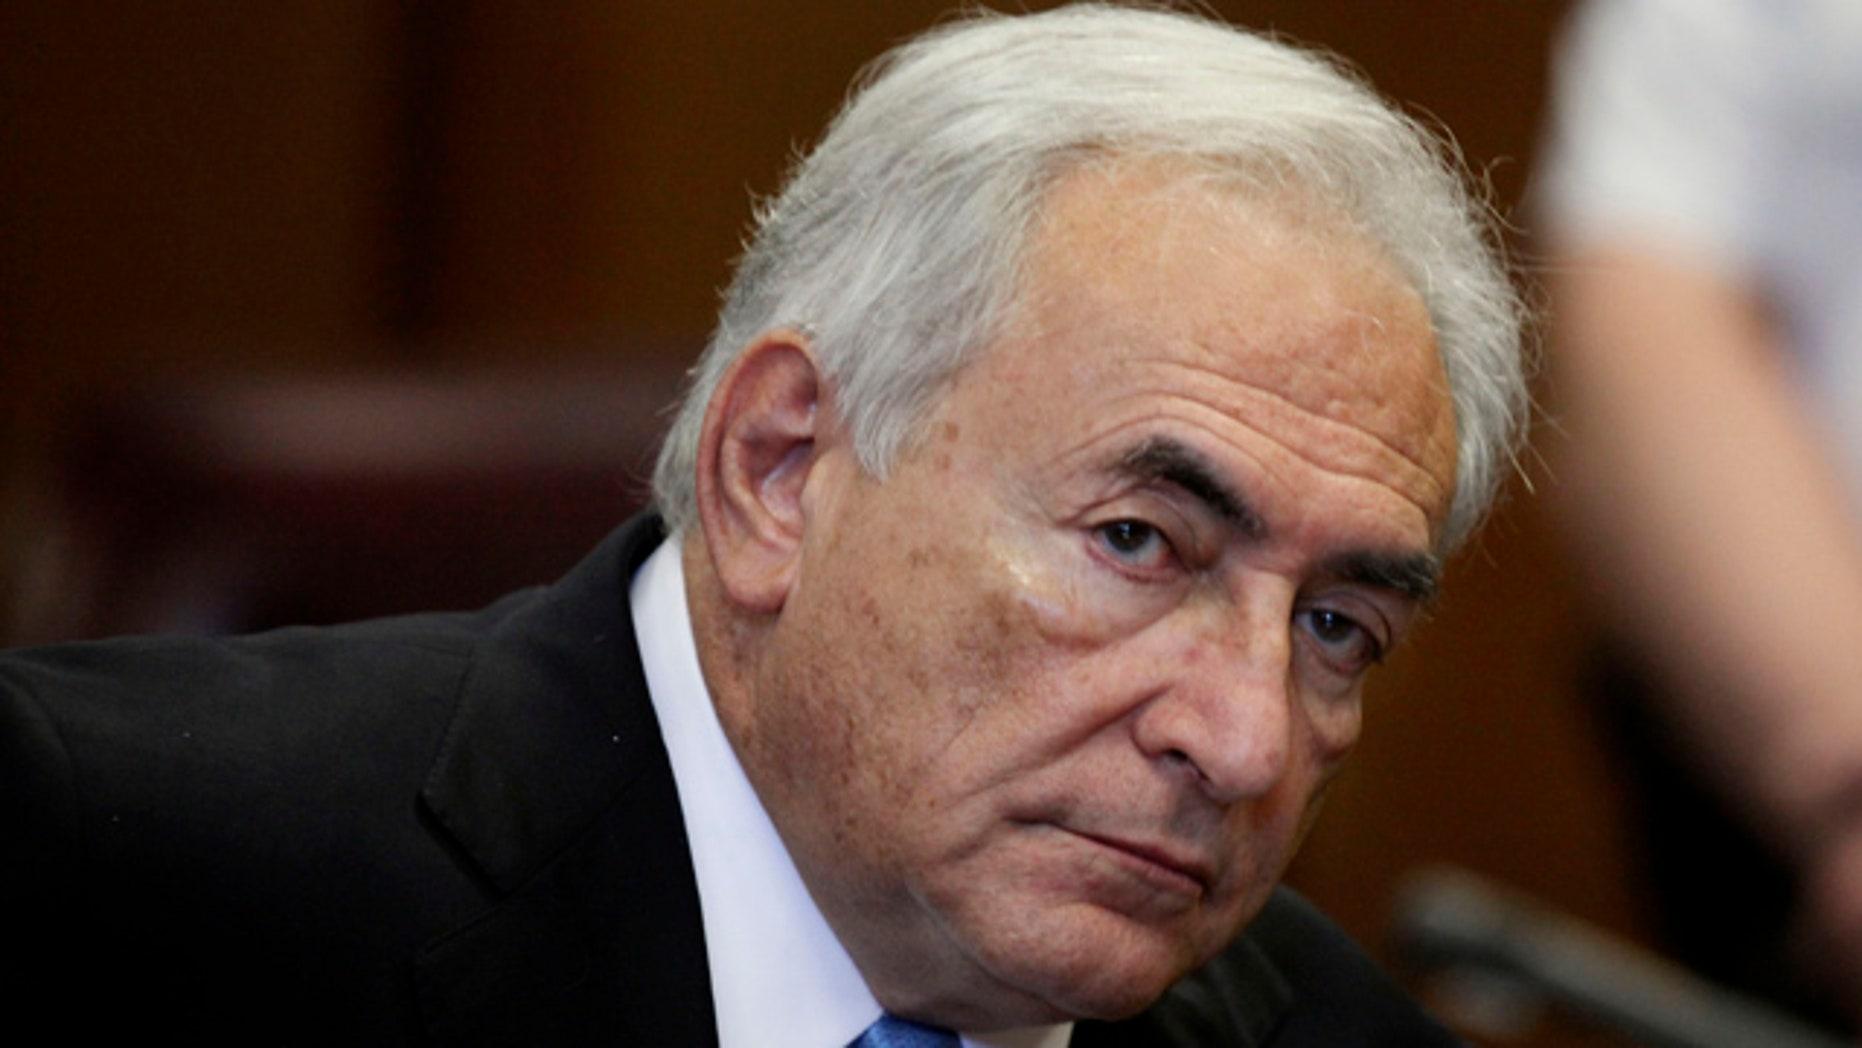 July 1, 2012: Former International Monetary Fund leader Dominique Strauss-Kahn listens to proceedings in New York State Supreme court in New York.